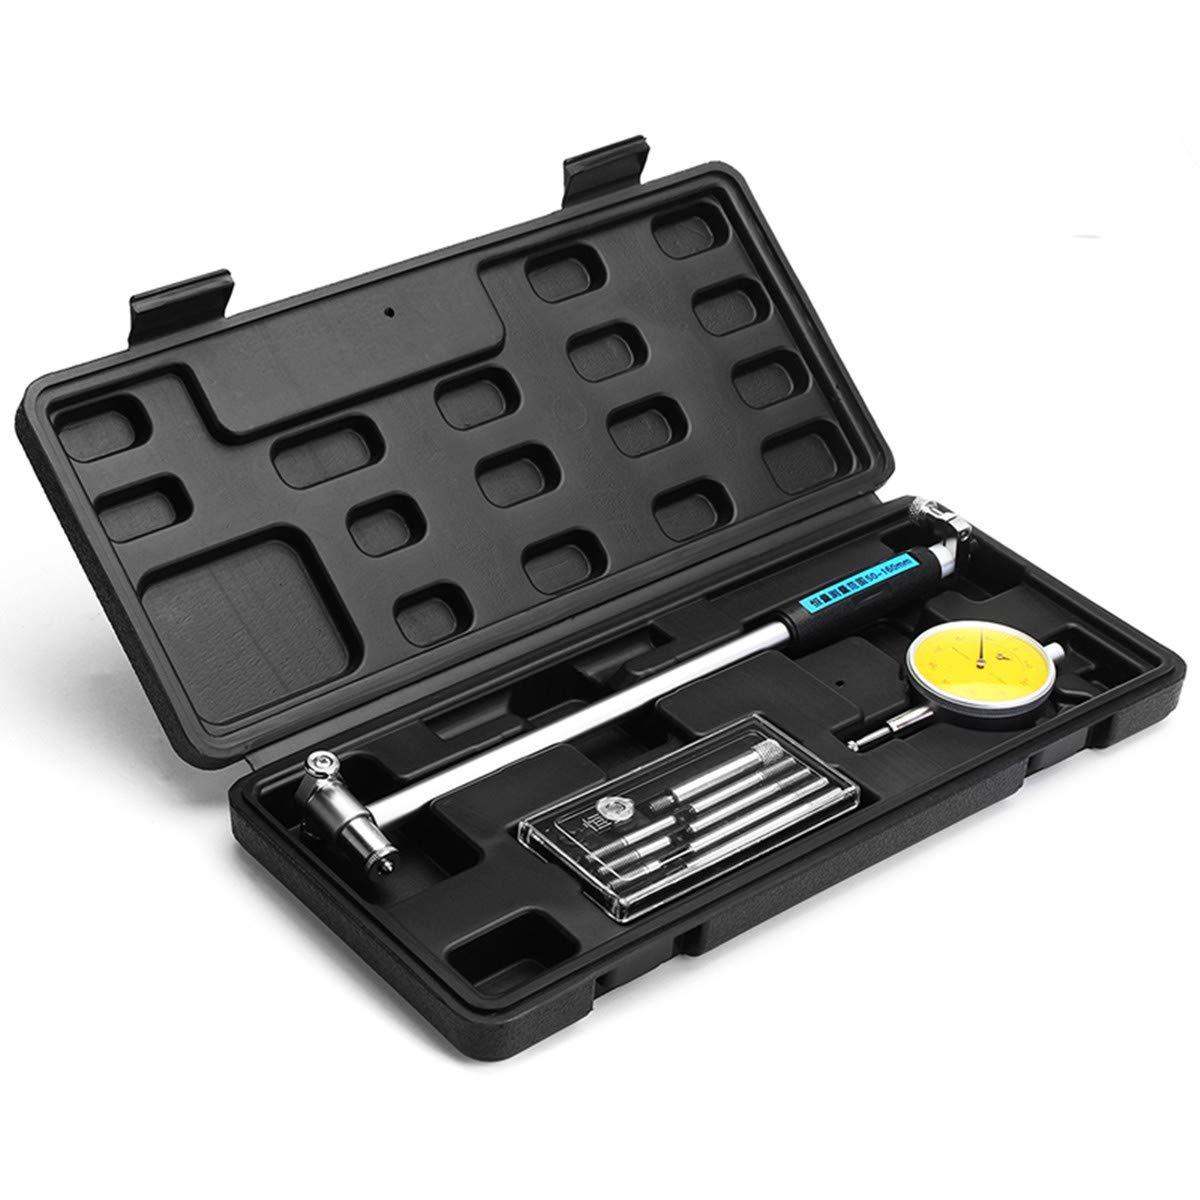 KUNSE 50Mm-160Mm 0.01 mm Digitales Ziffern Bohrger/ät Motorzylinder Messwerkzeug-Messger/ät